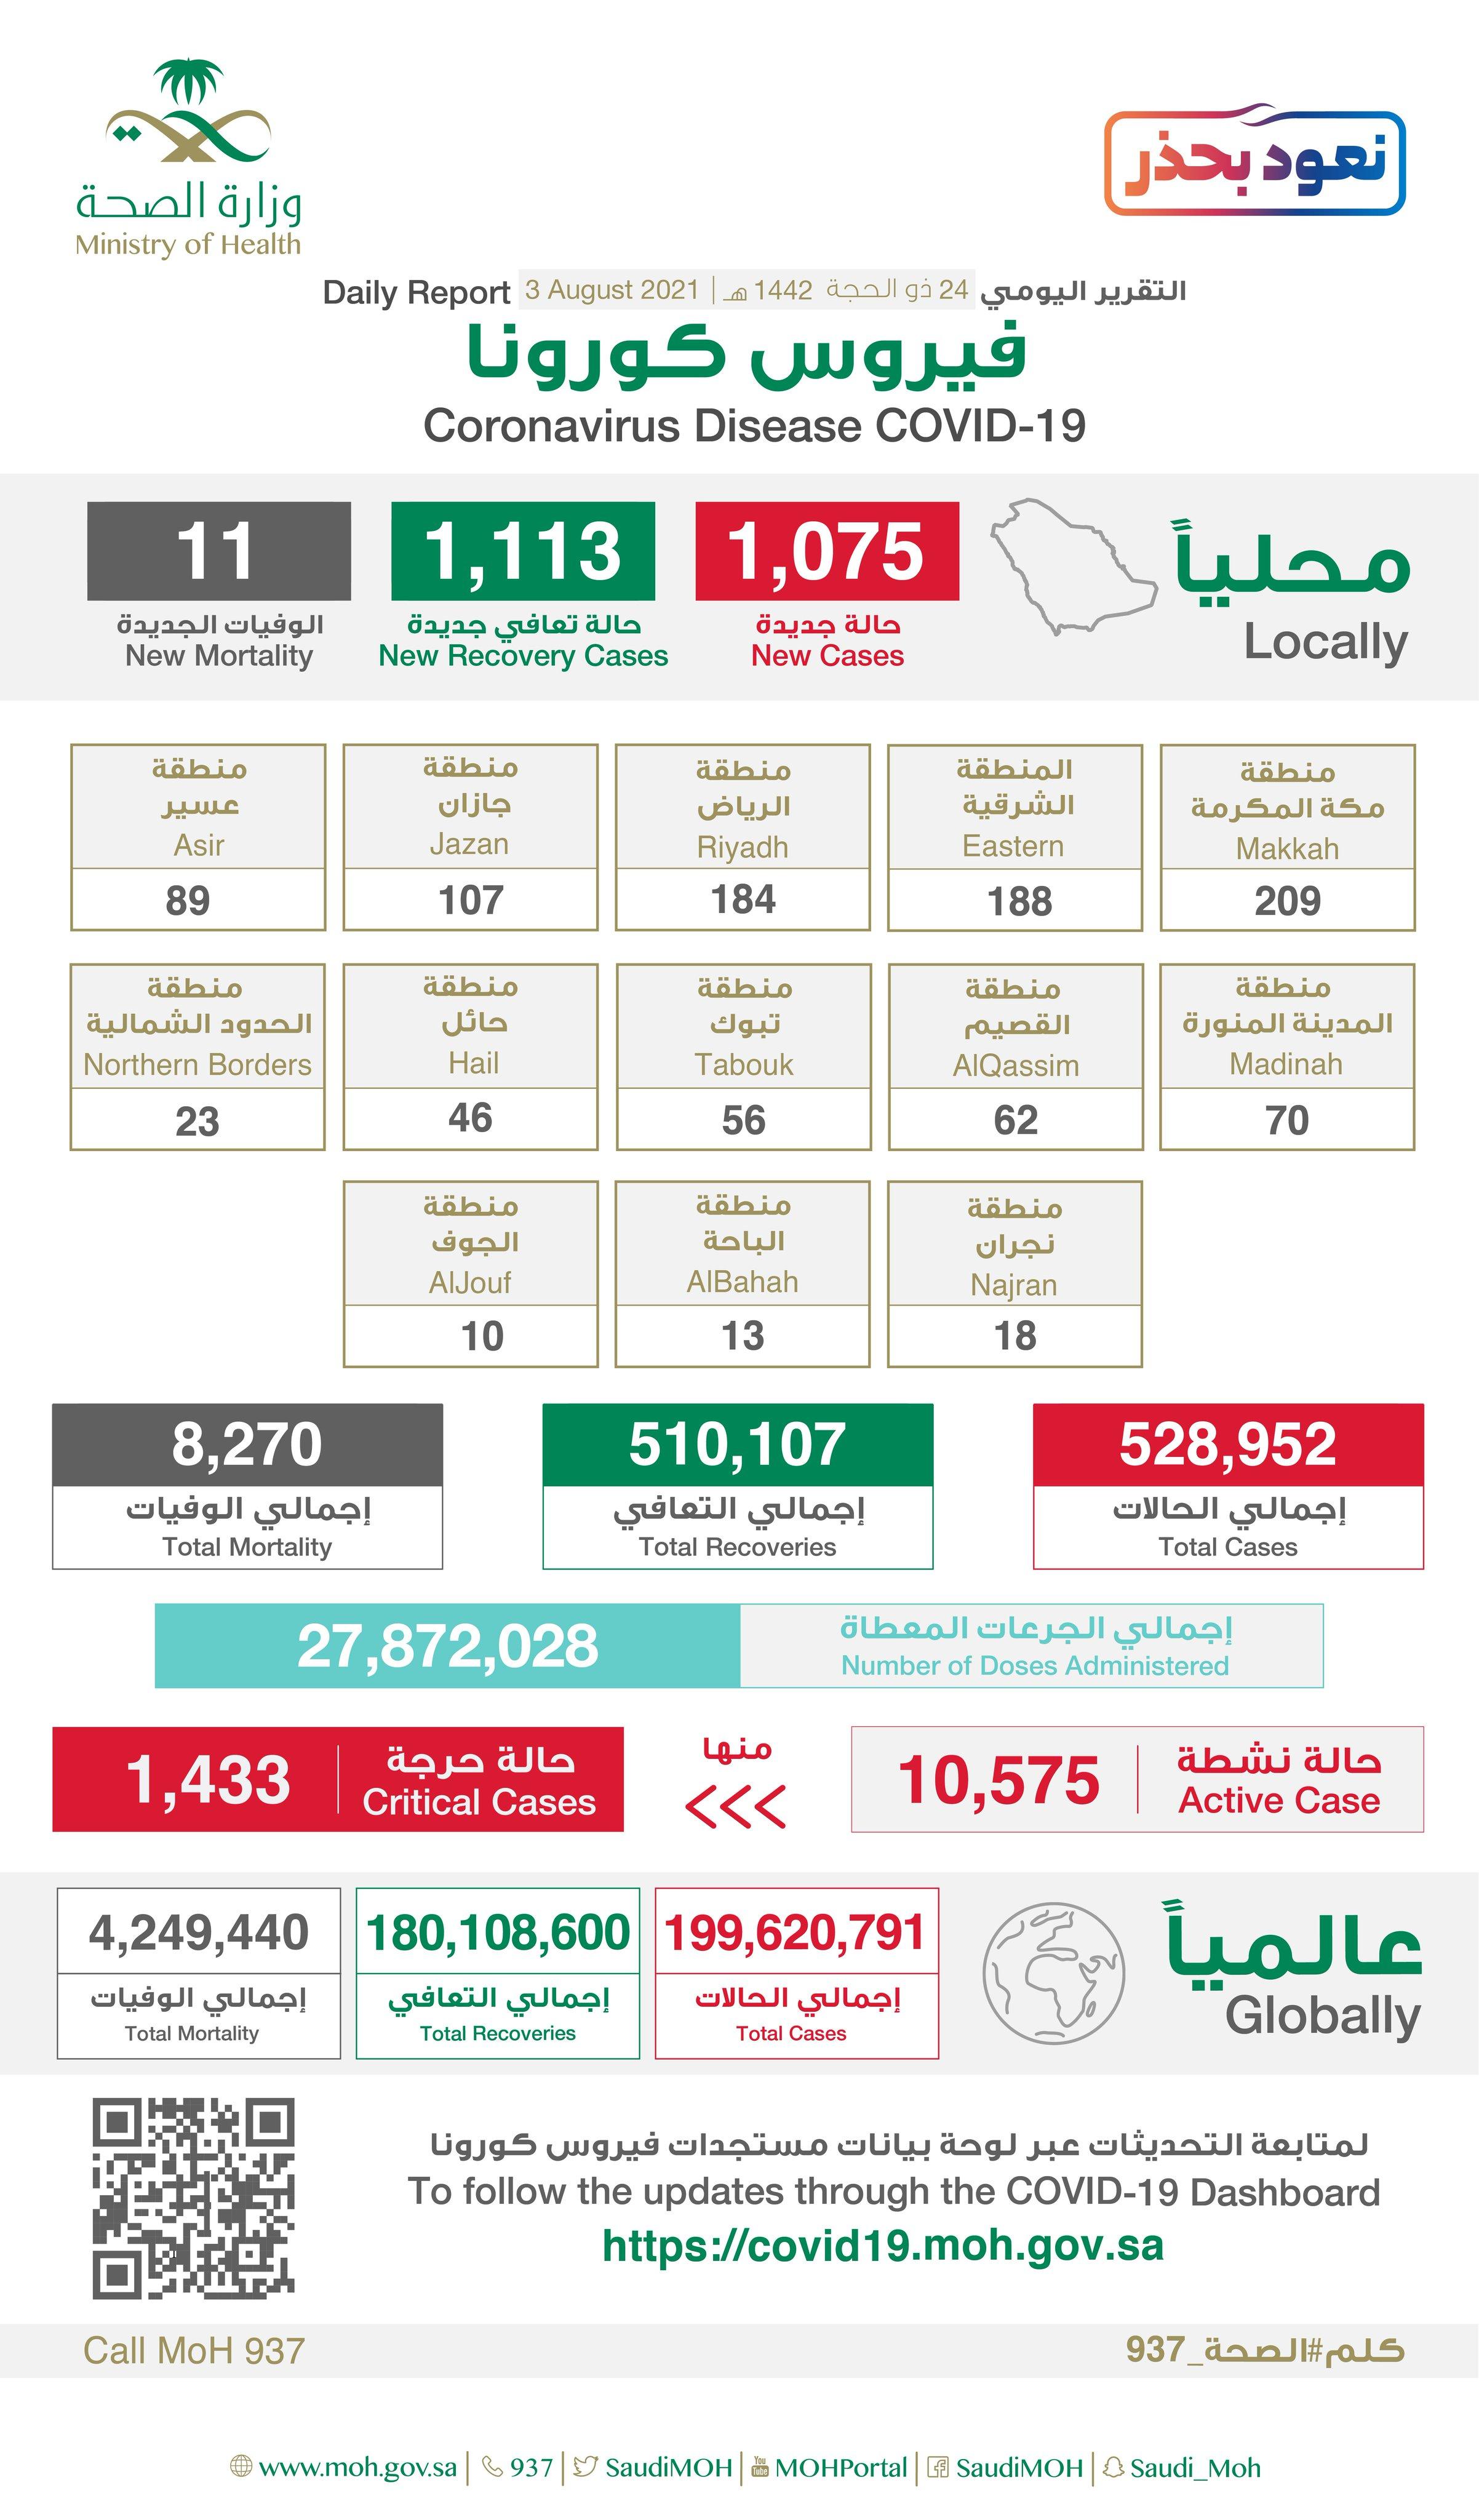 Saudi Arabia Coronavirus : Total Cases : 528,952 , New Cases :1,075, Cured : 510,107 , Deaths: 8,270 , Active Cases : 10,575